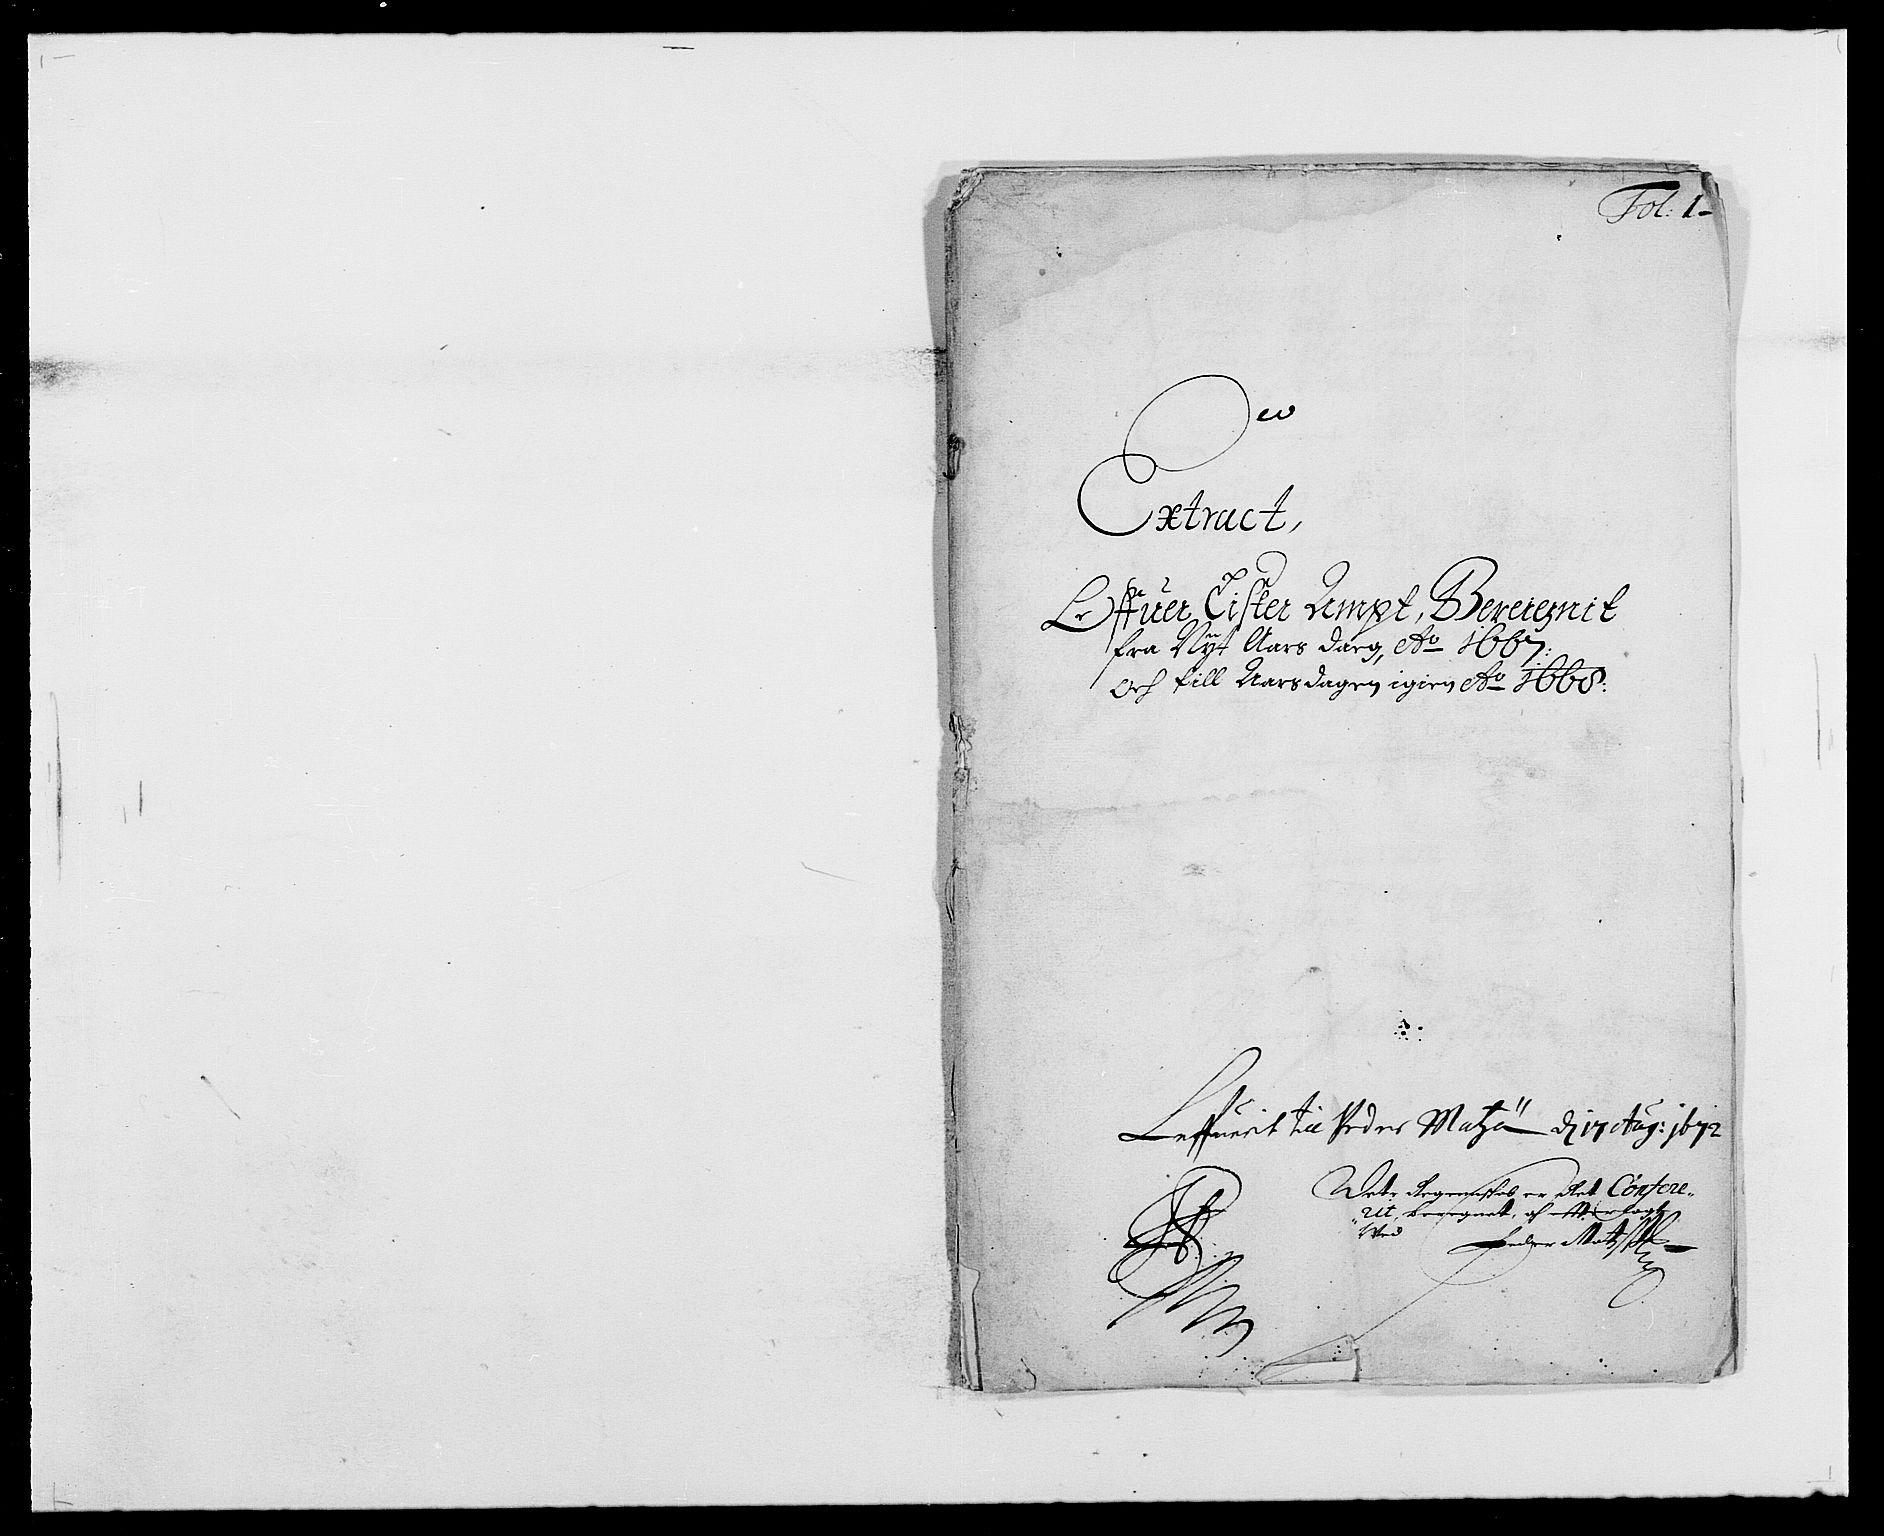 RA, Rentekammeret inntil 1814, Reviderte regnskaper, Fogderegnskap, R41/L2524: Fogderegnskap Lista, 1665-1668, s. 265